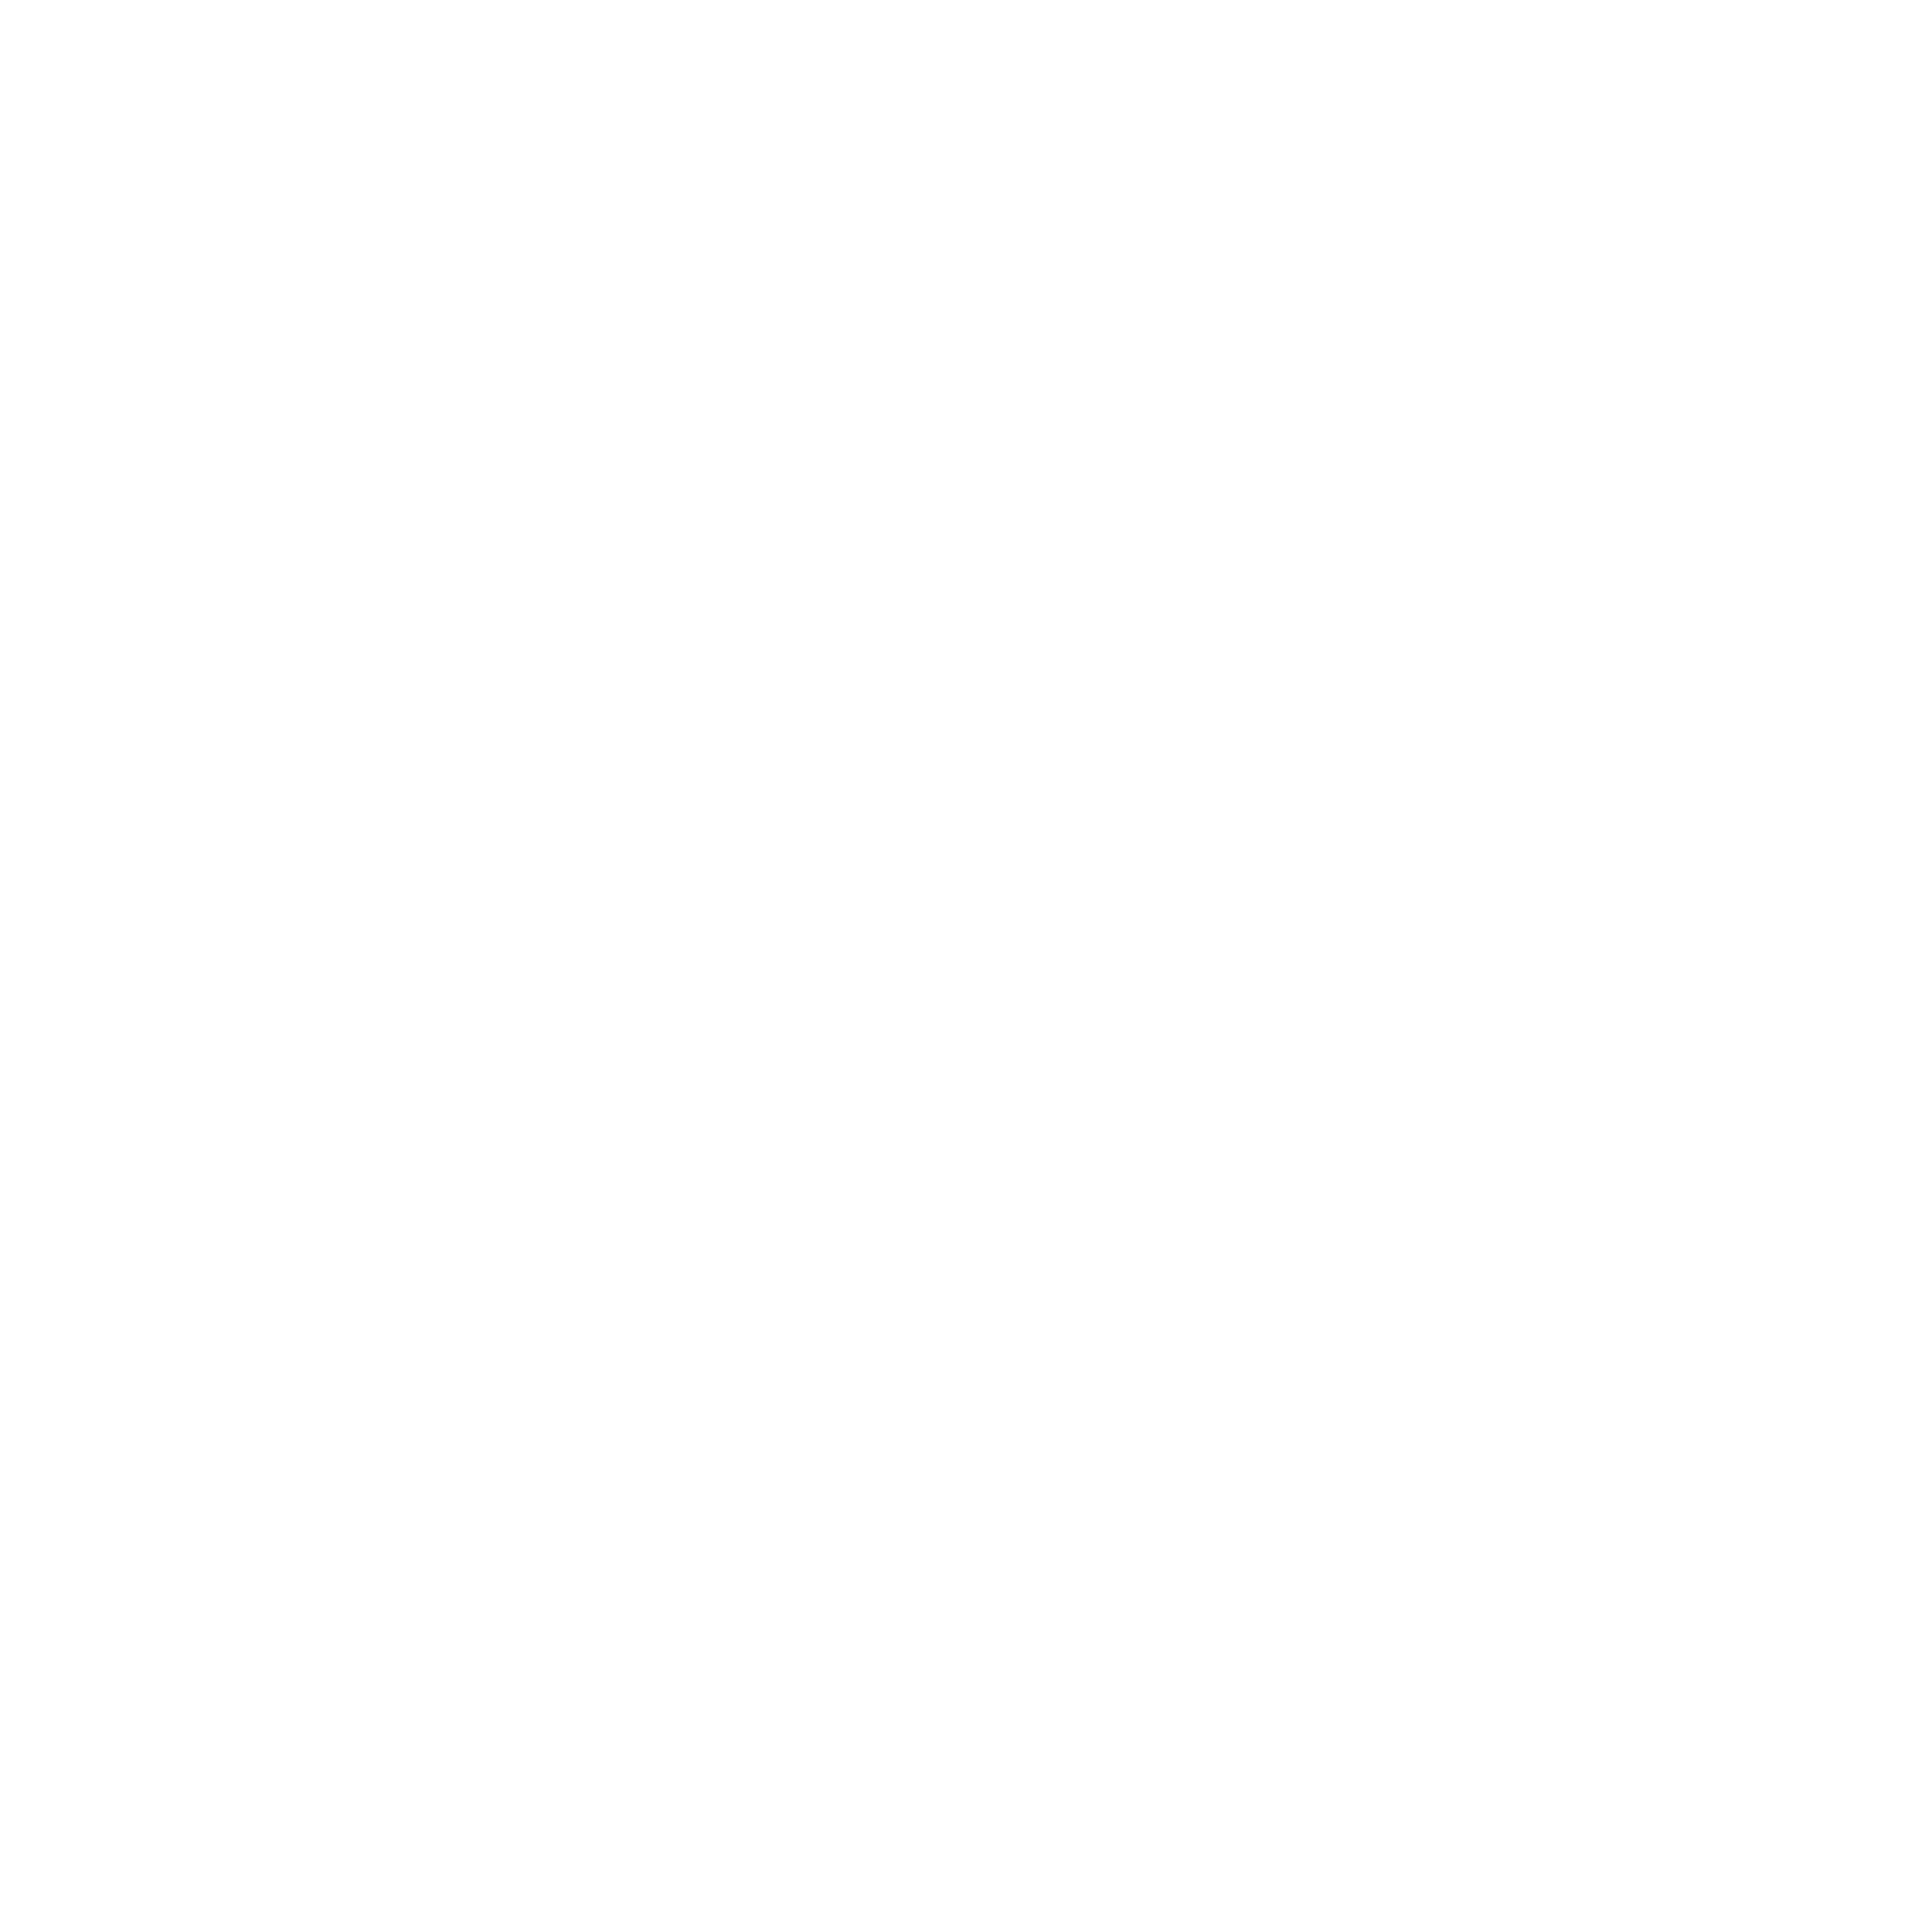 Mortgage innovators_Elite_horizontal white